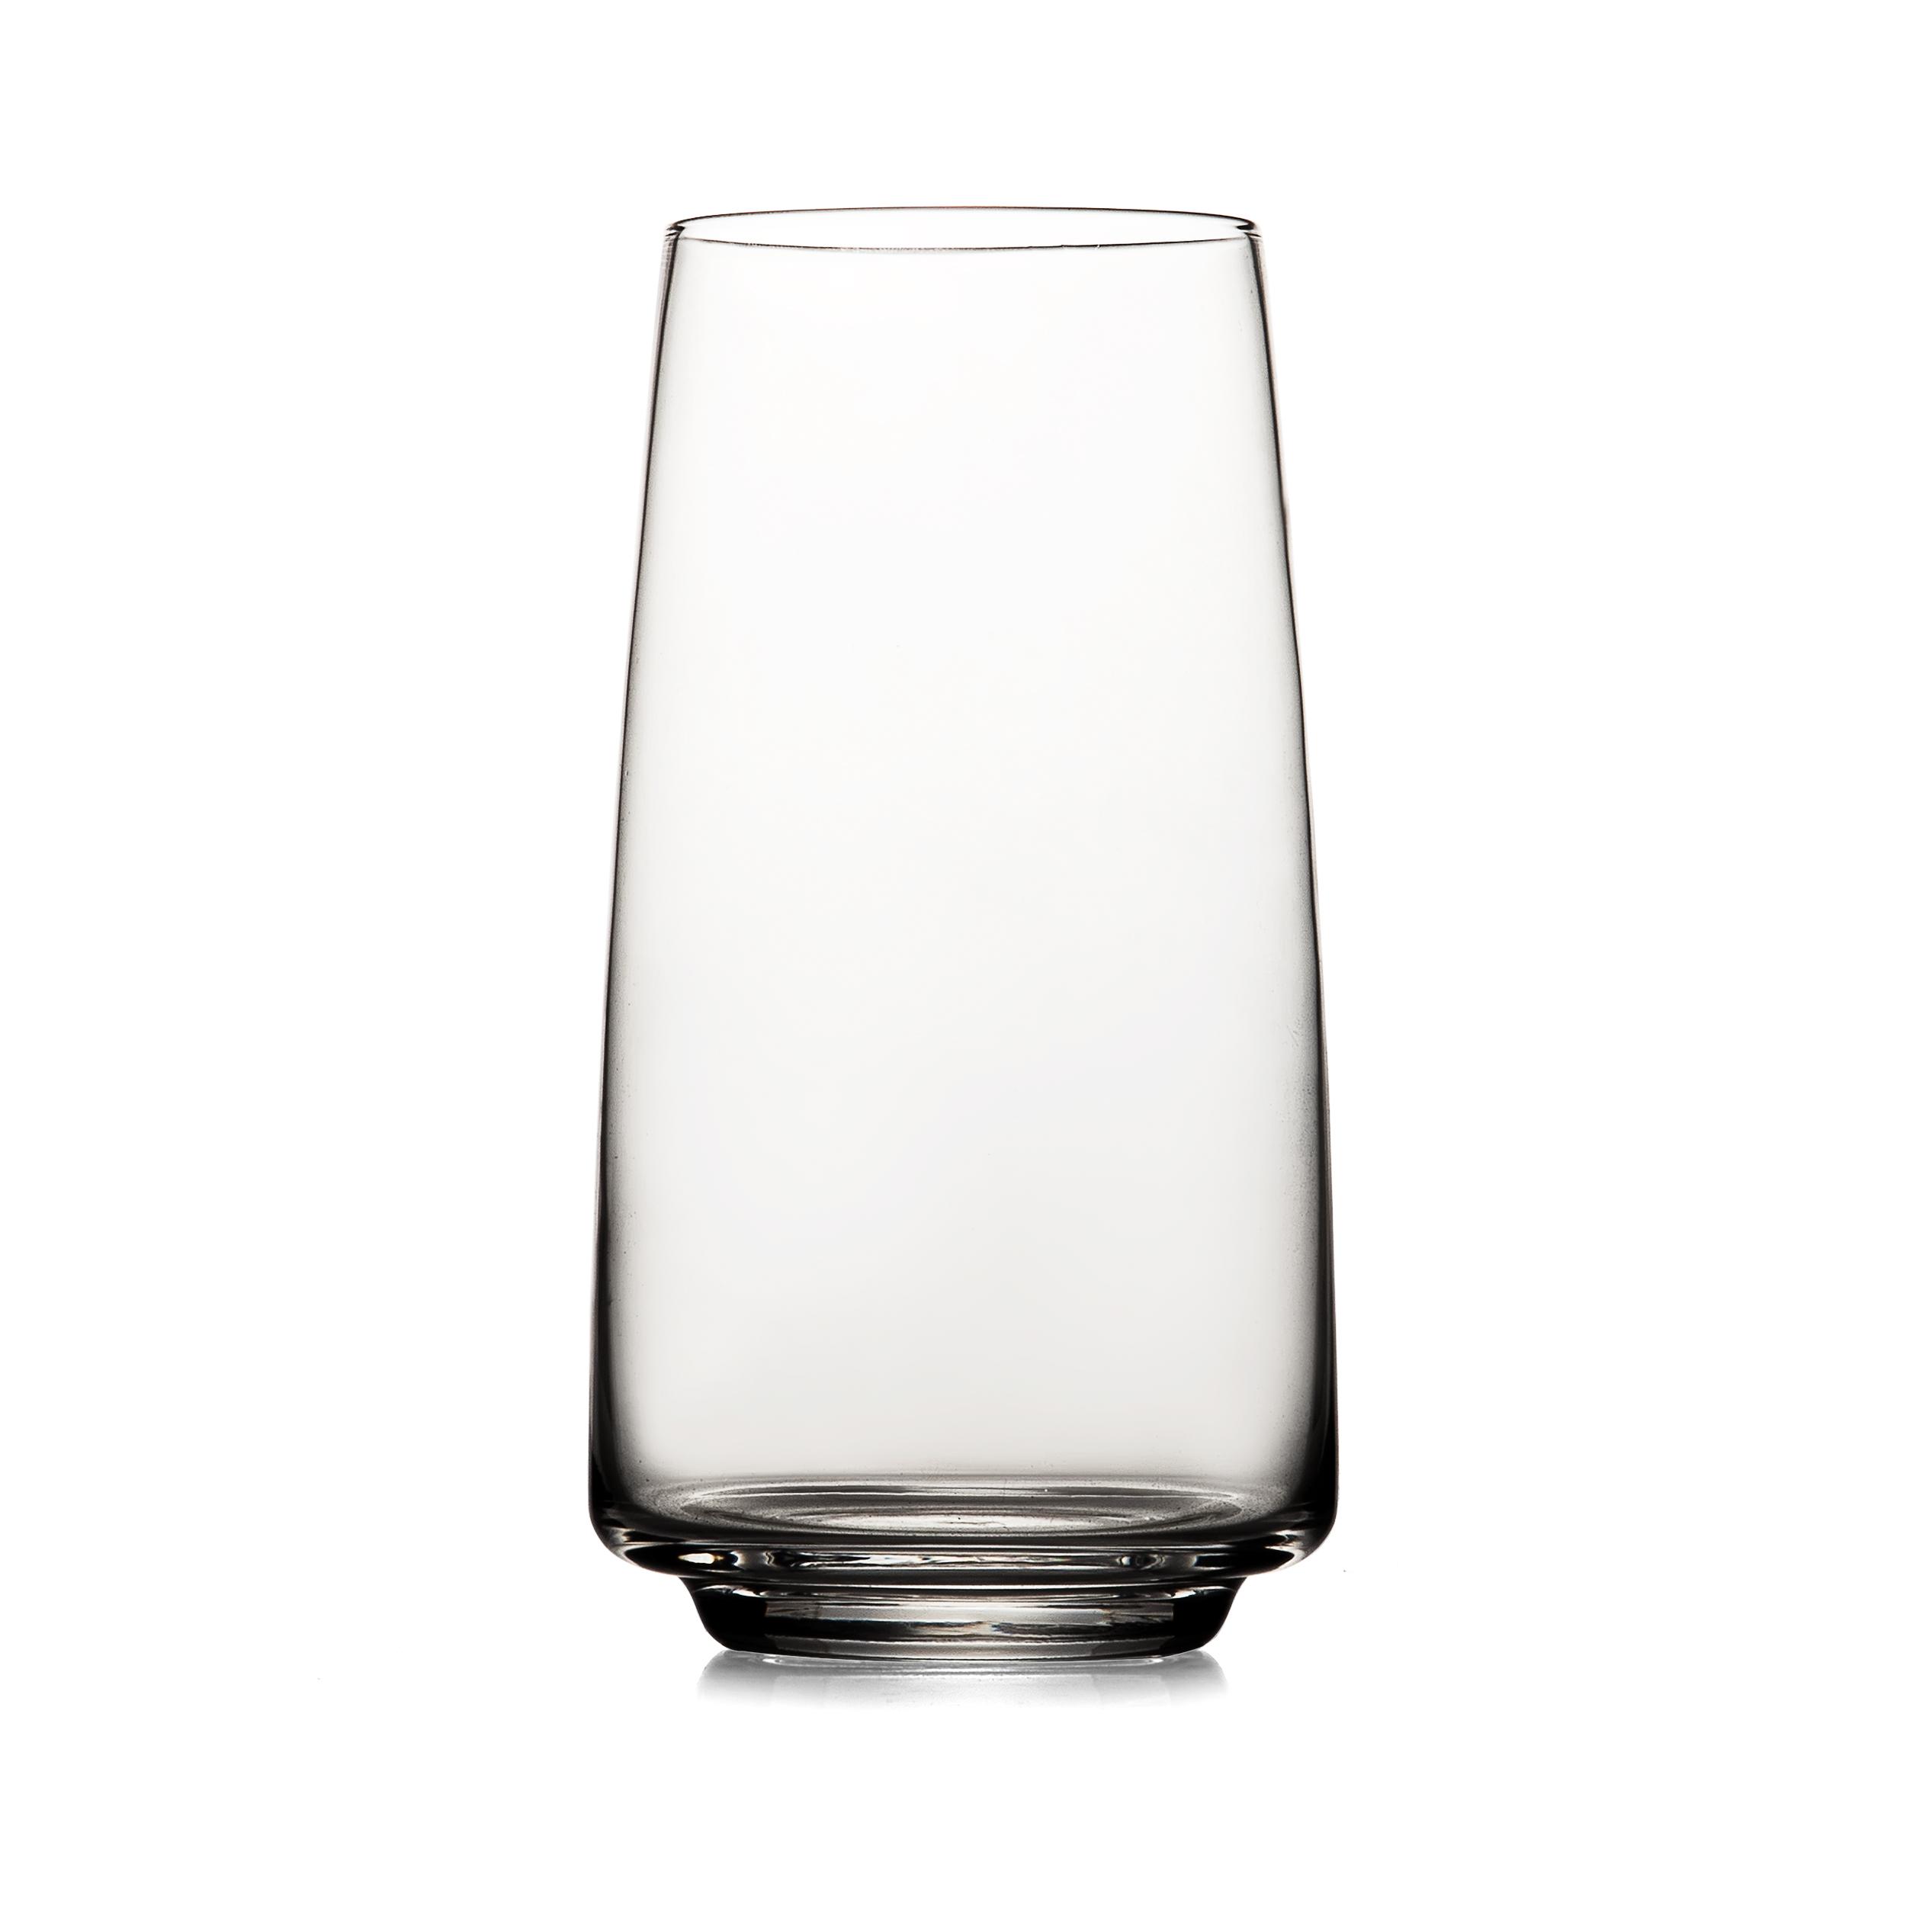 HI BALL GLASS SET OF 4 - lumina